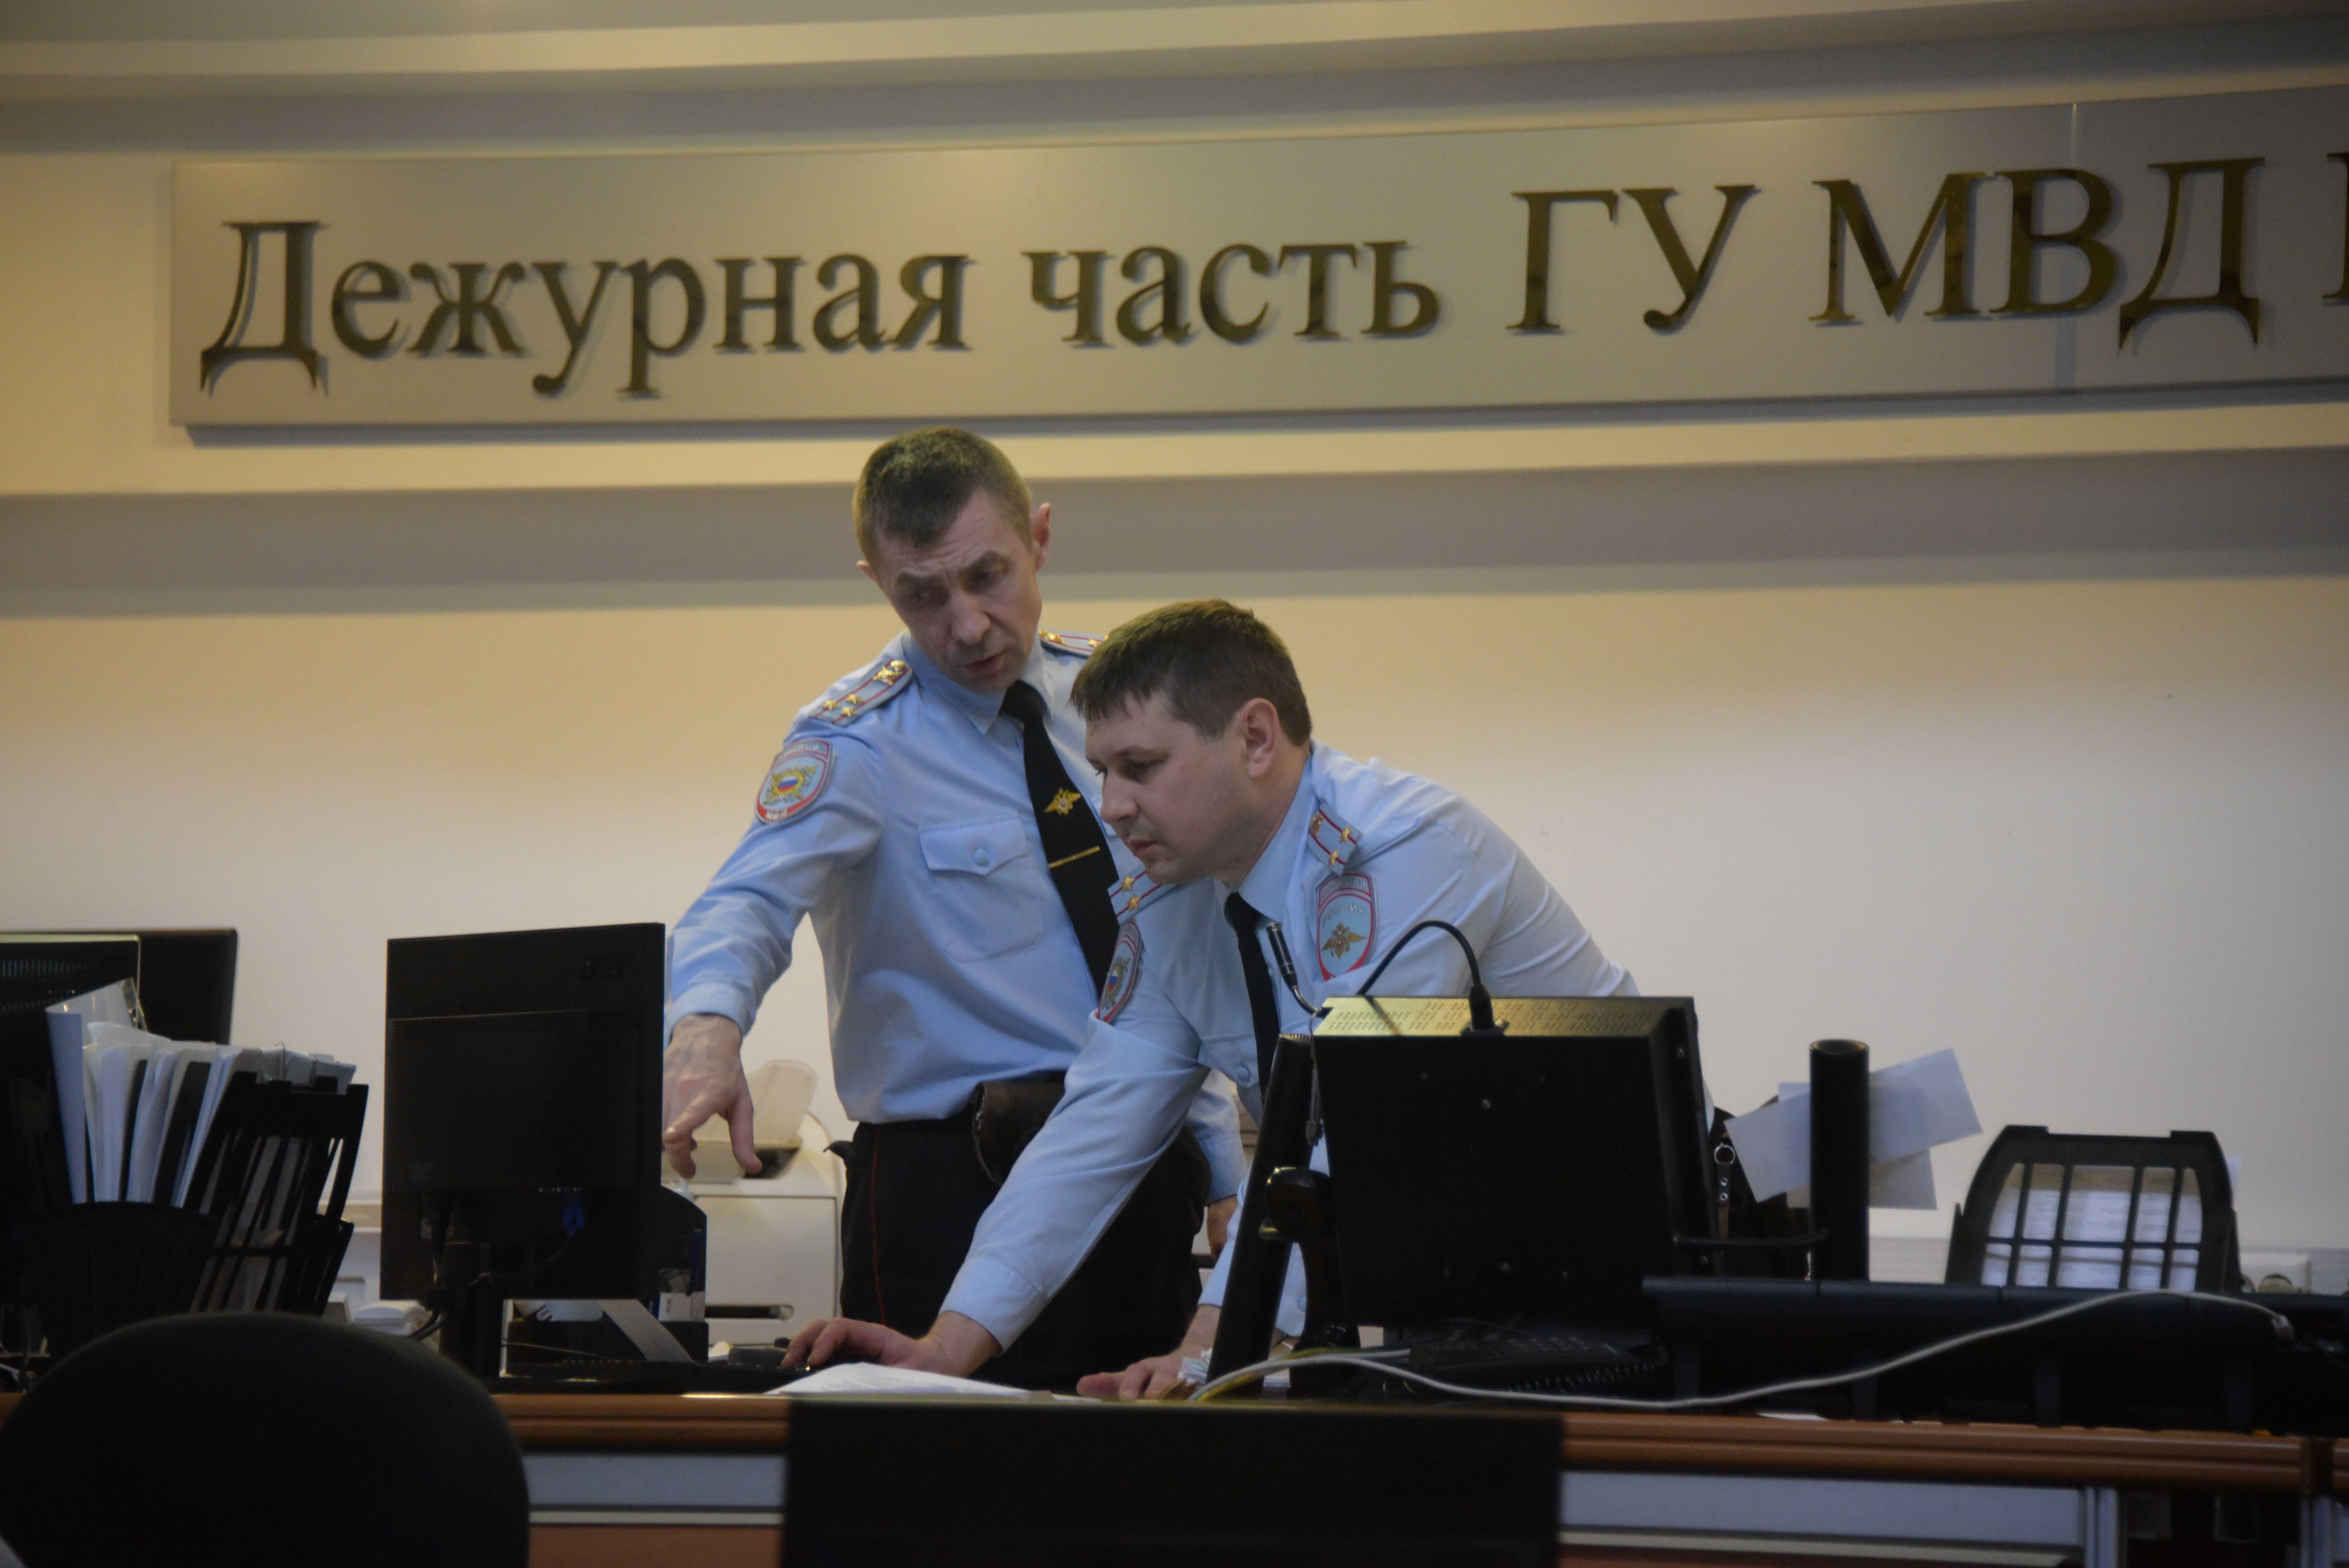 Девушка лишилась сумки Valentino и iPhone 6 после ночи в ресторане на юго-востоке Москвы